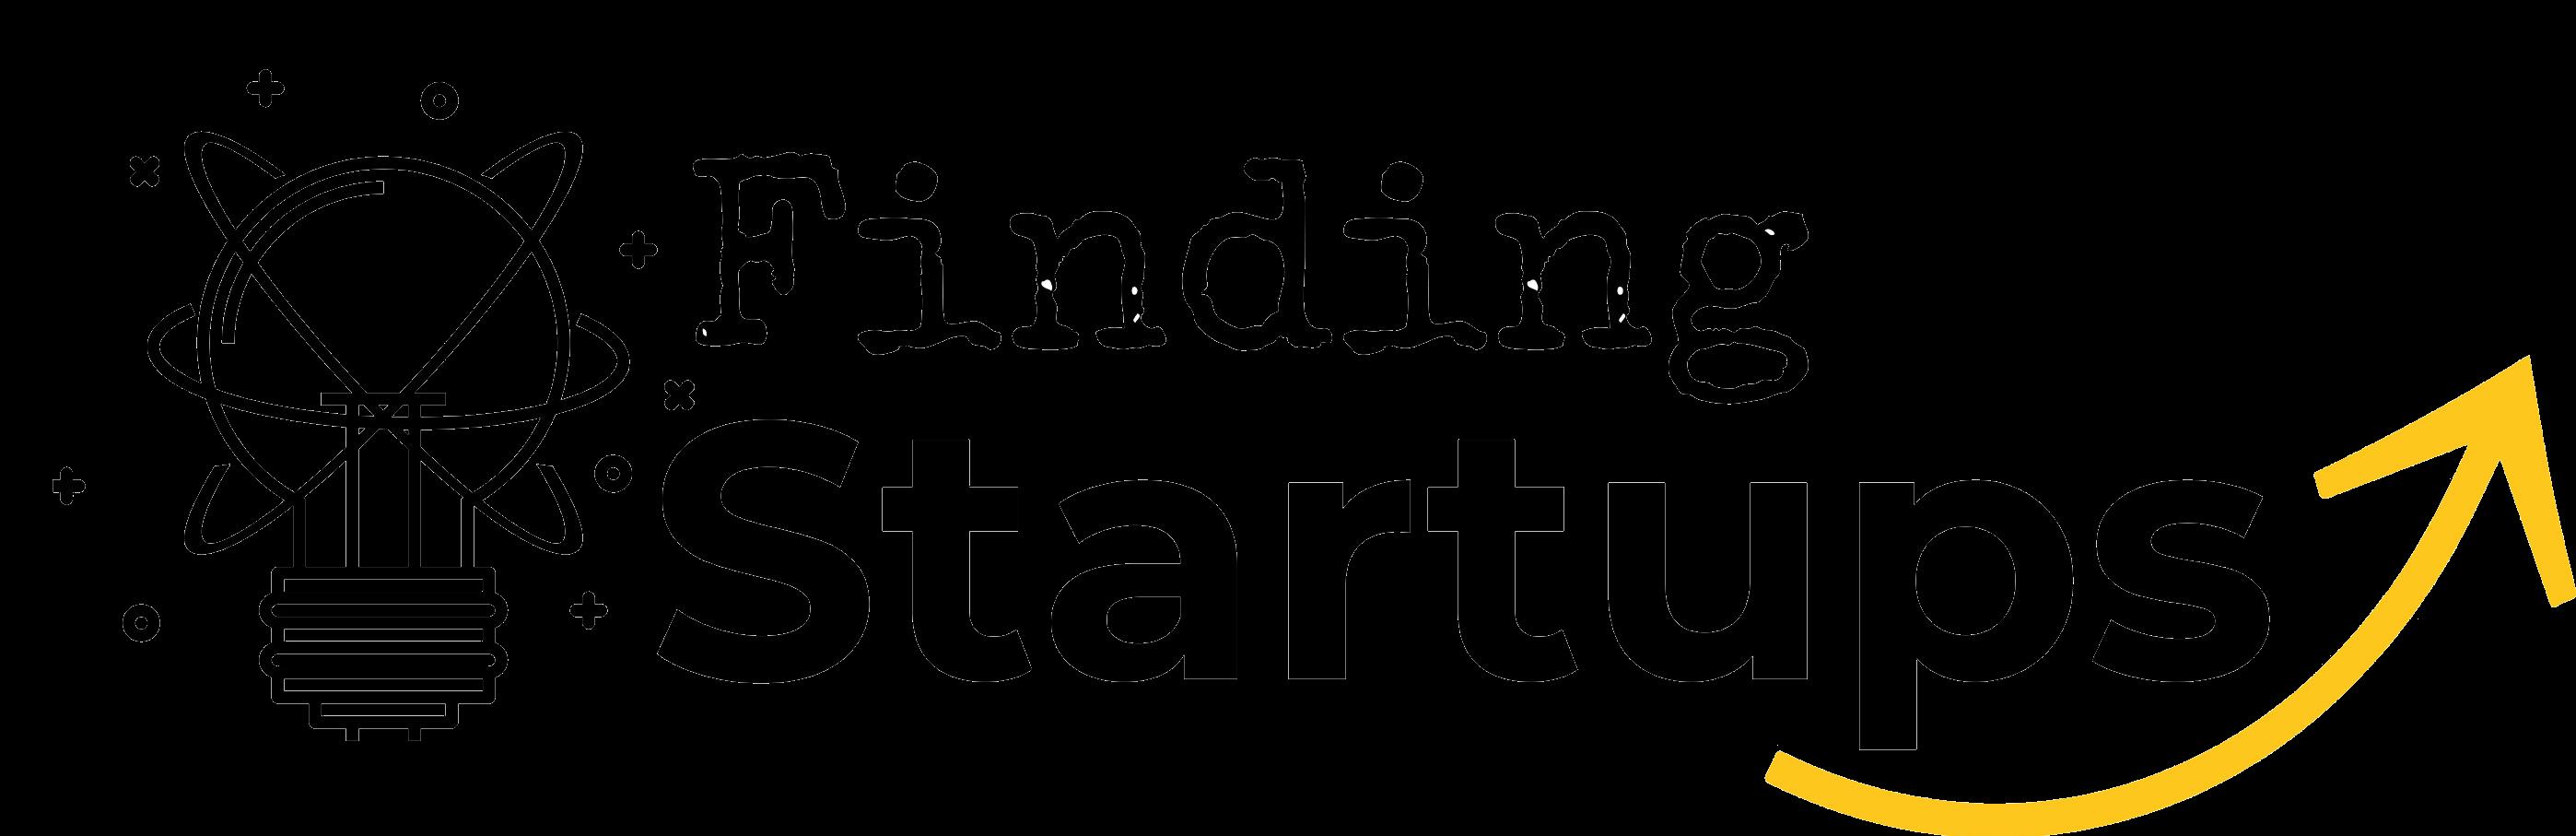 Finding startups - supporter